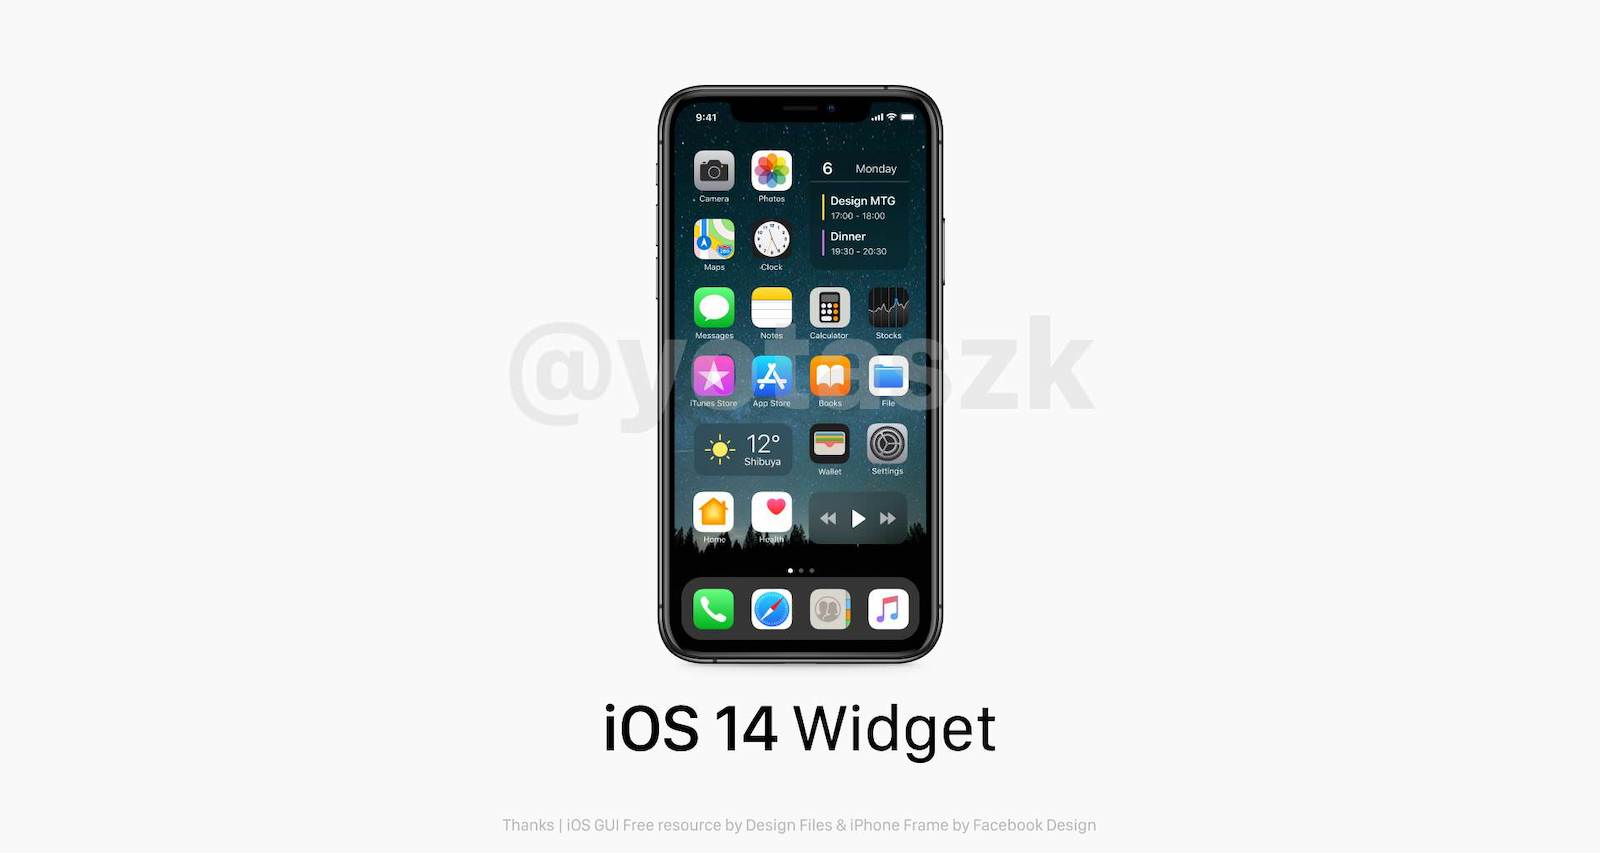 iOS14-widget-concept-image-by-yotasuzuki.jpg